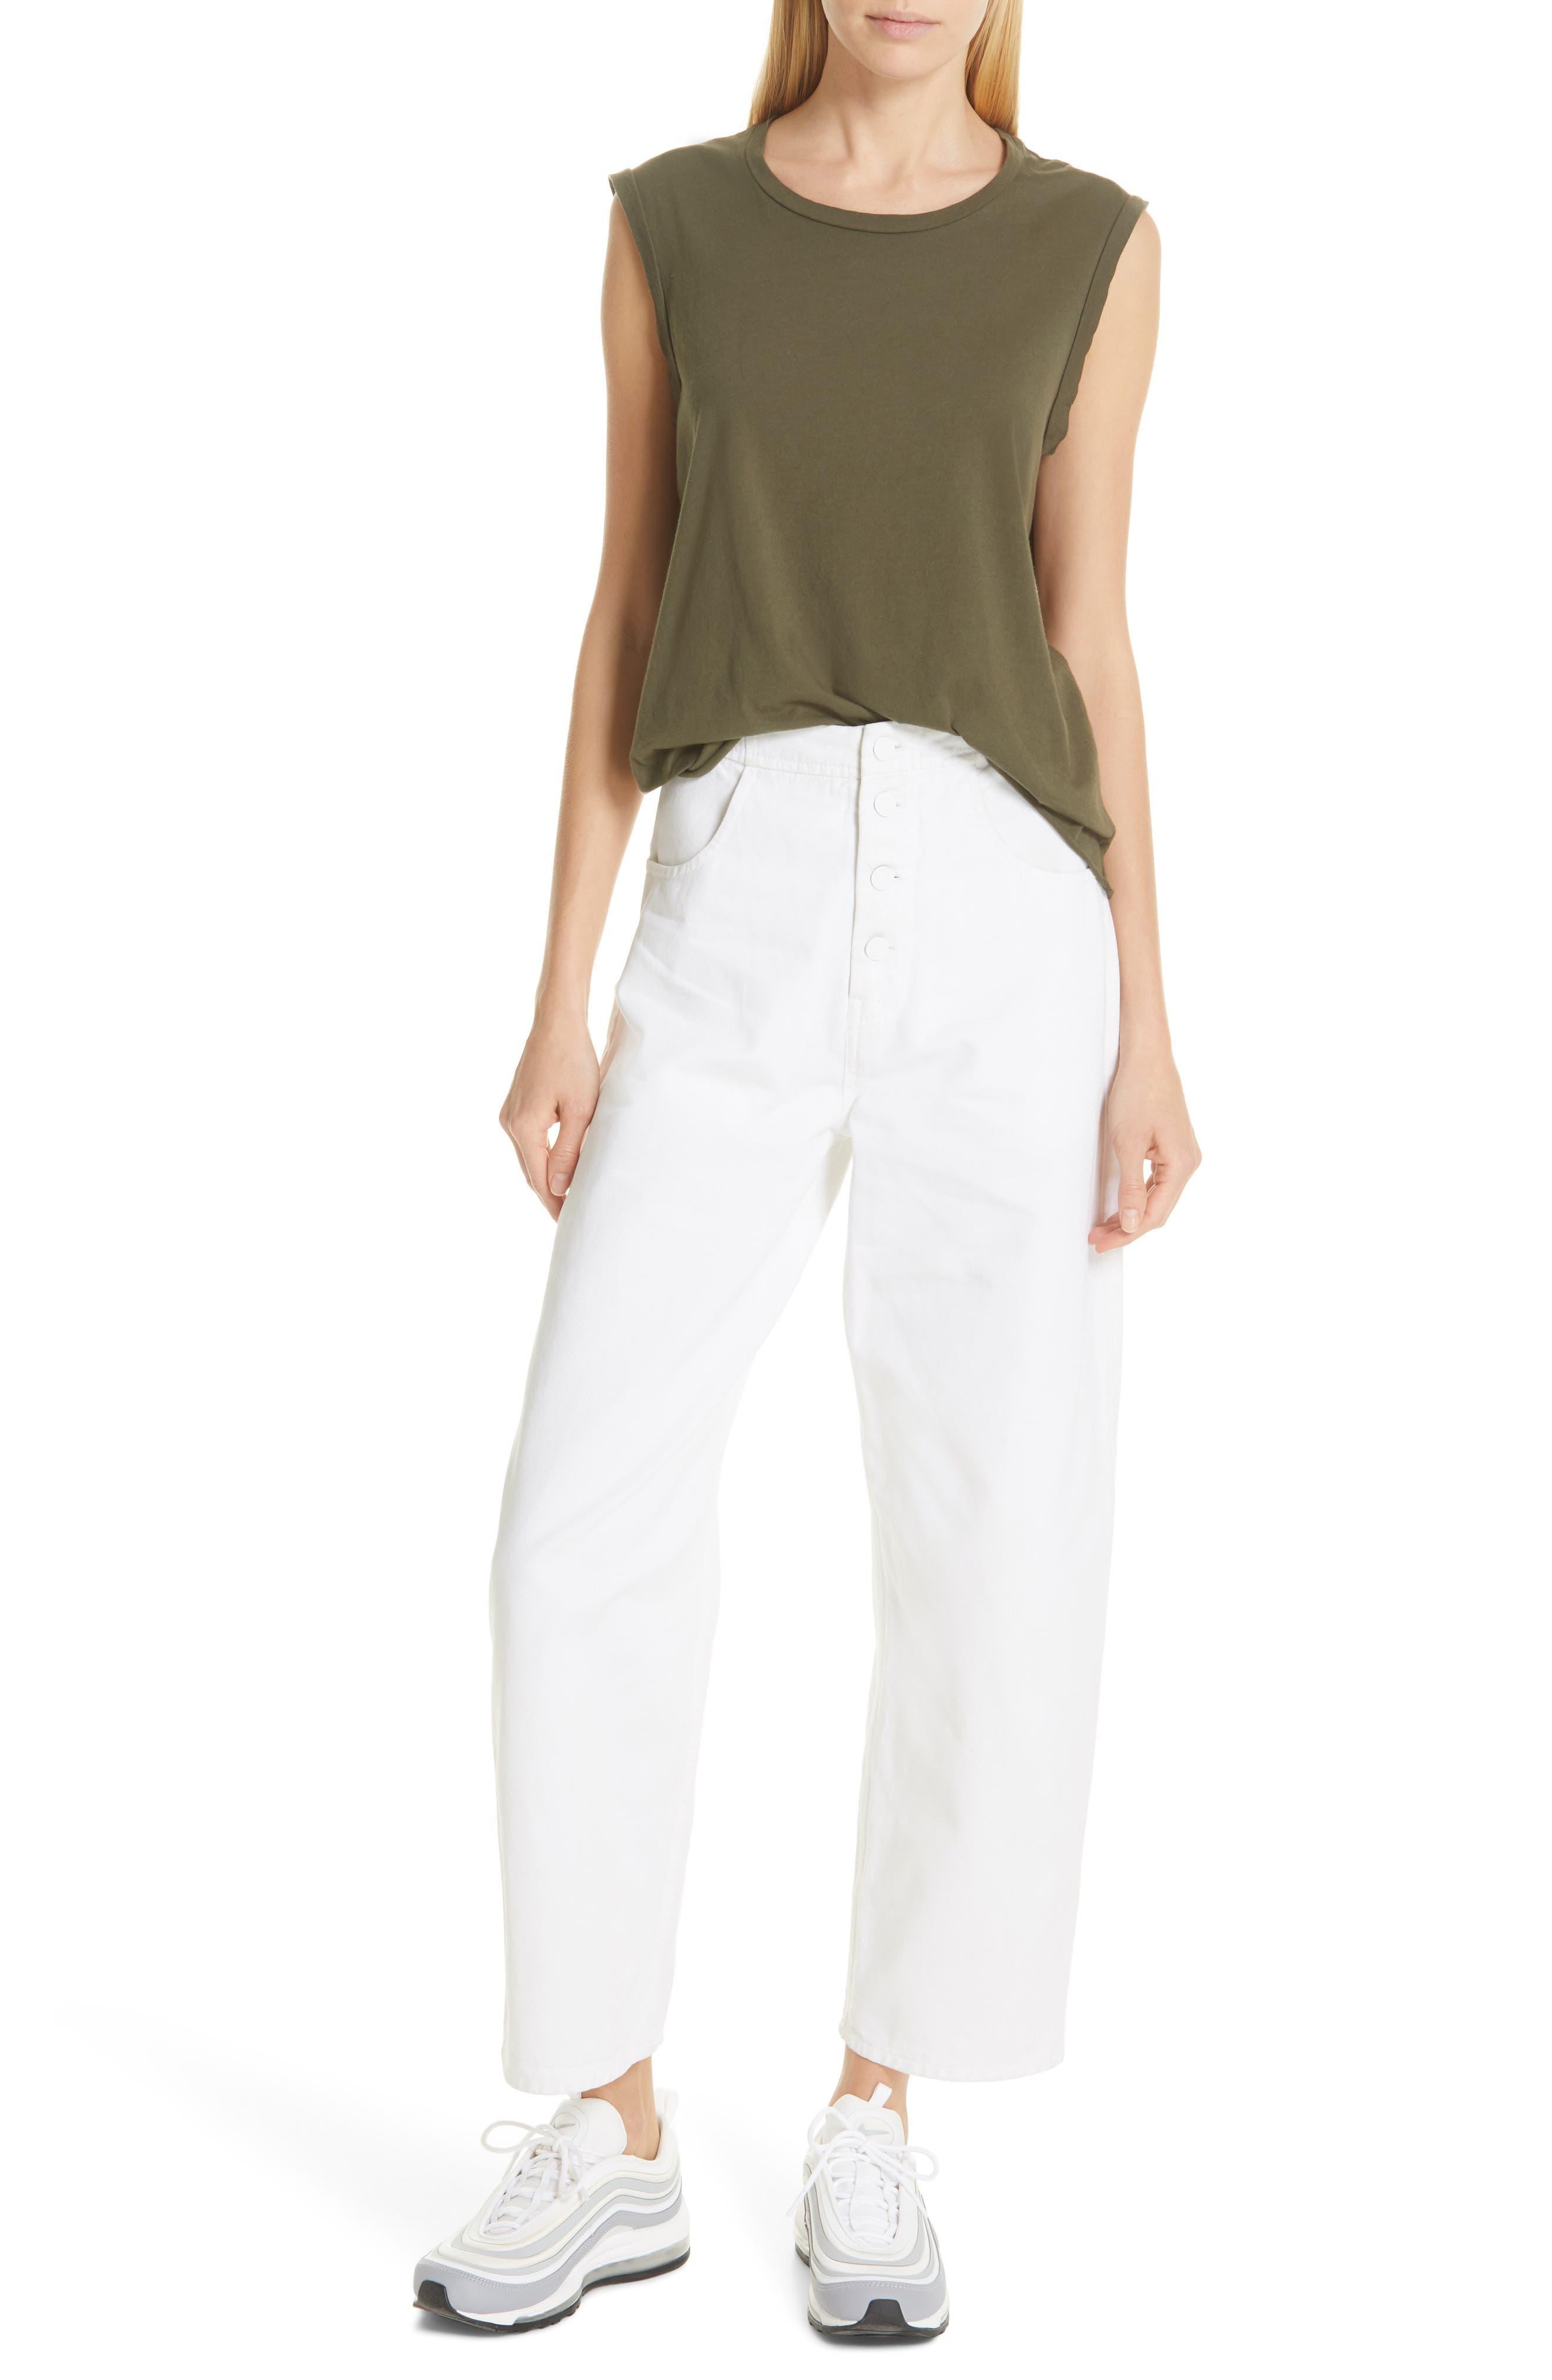 NILI LOTAN, Toledo Crop Cotton Pants, Alternate thumbnail 8, color, VINTAGE WHITE